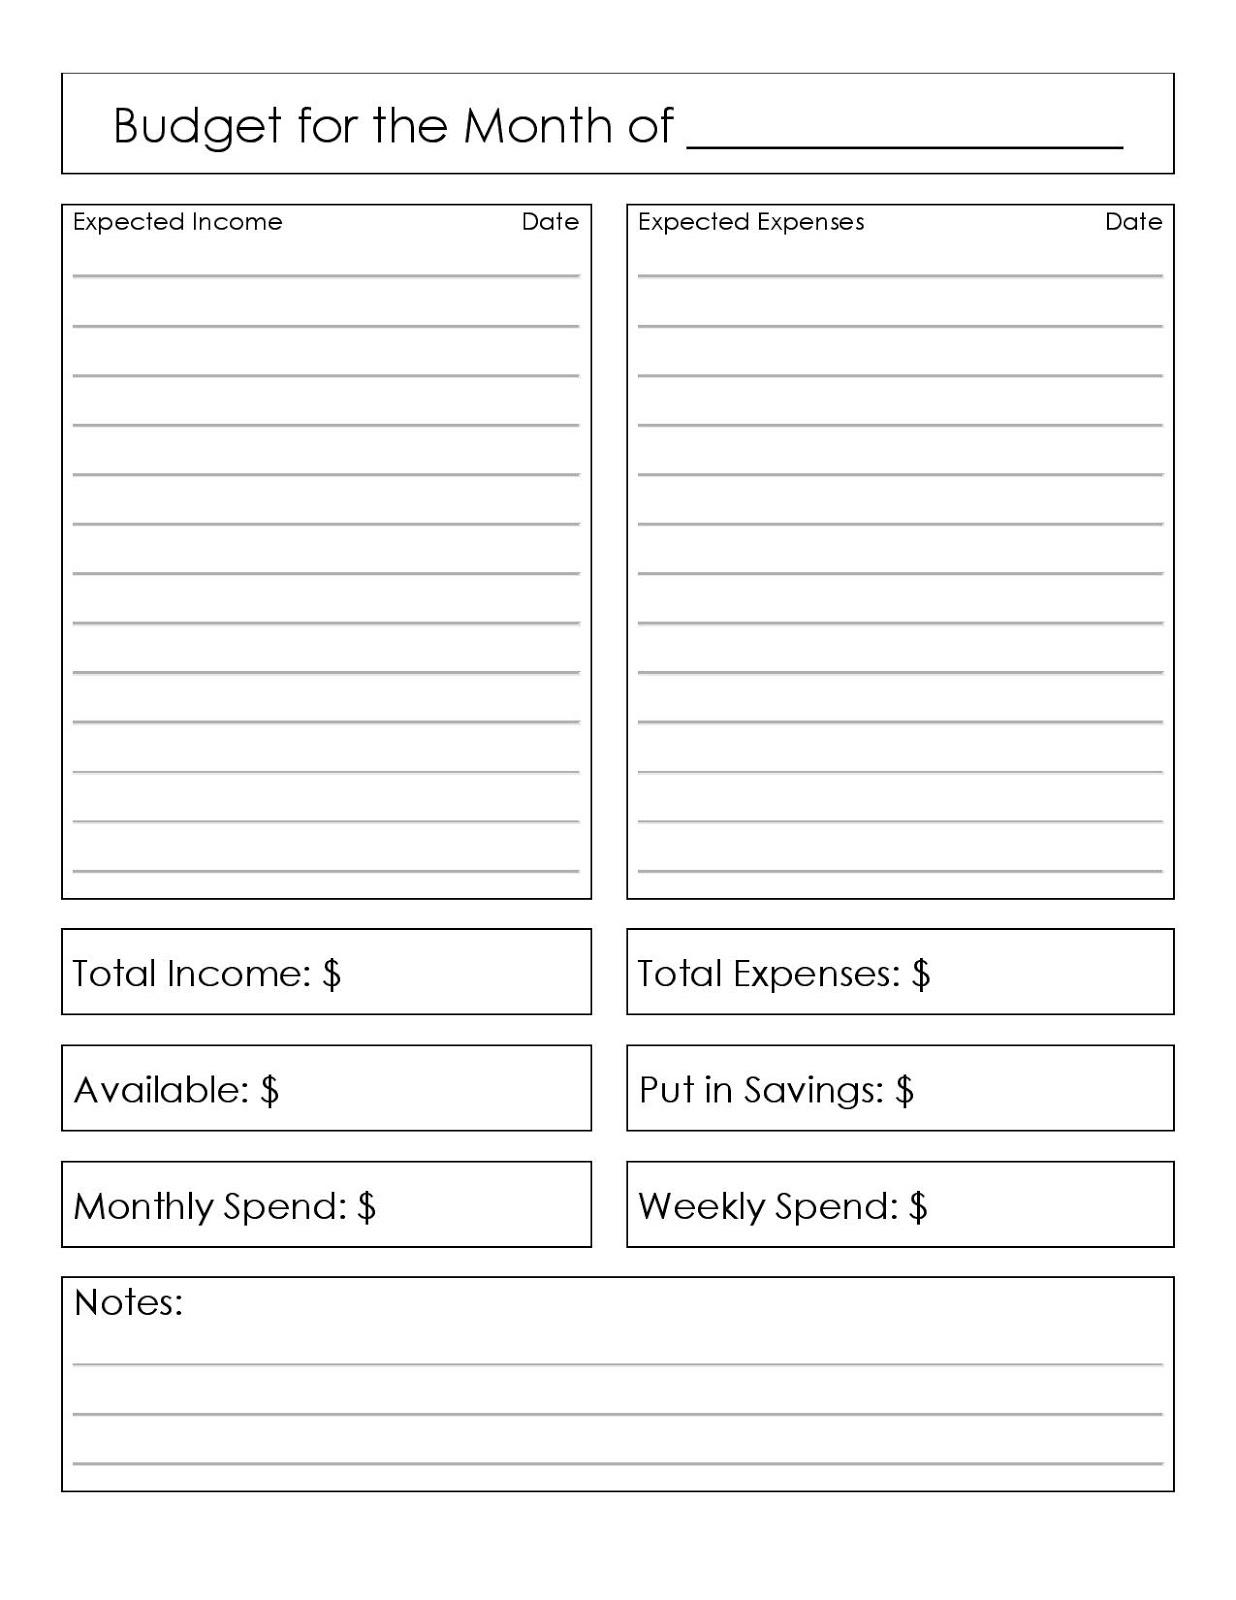 worksheet. Budgeting Worksheets For Adults. Worksheet Fun ...